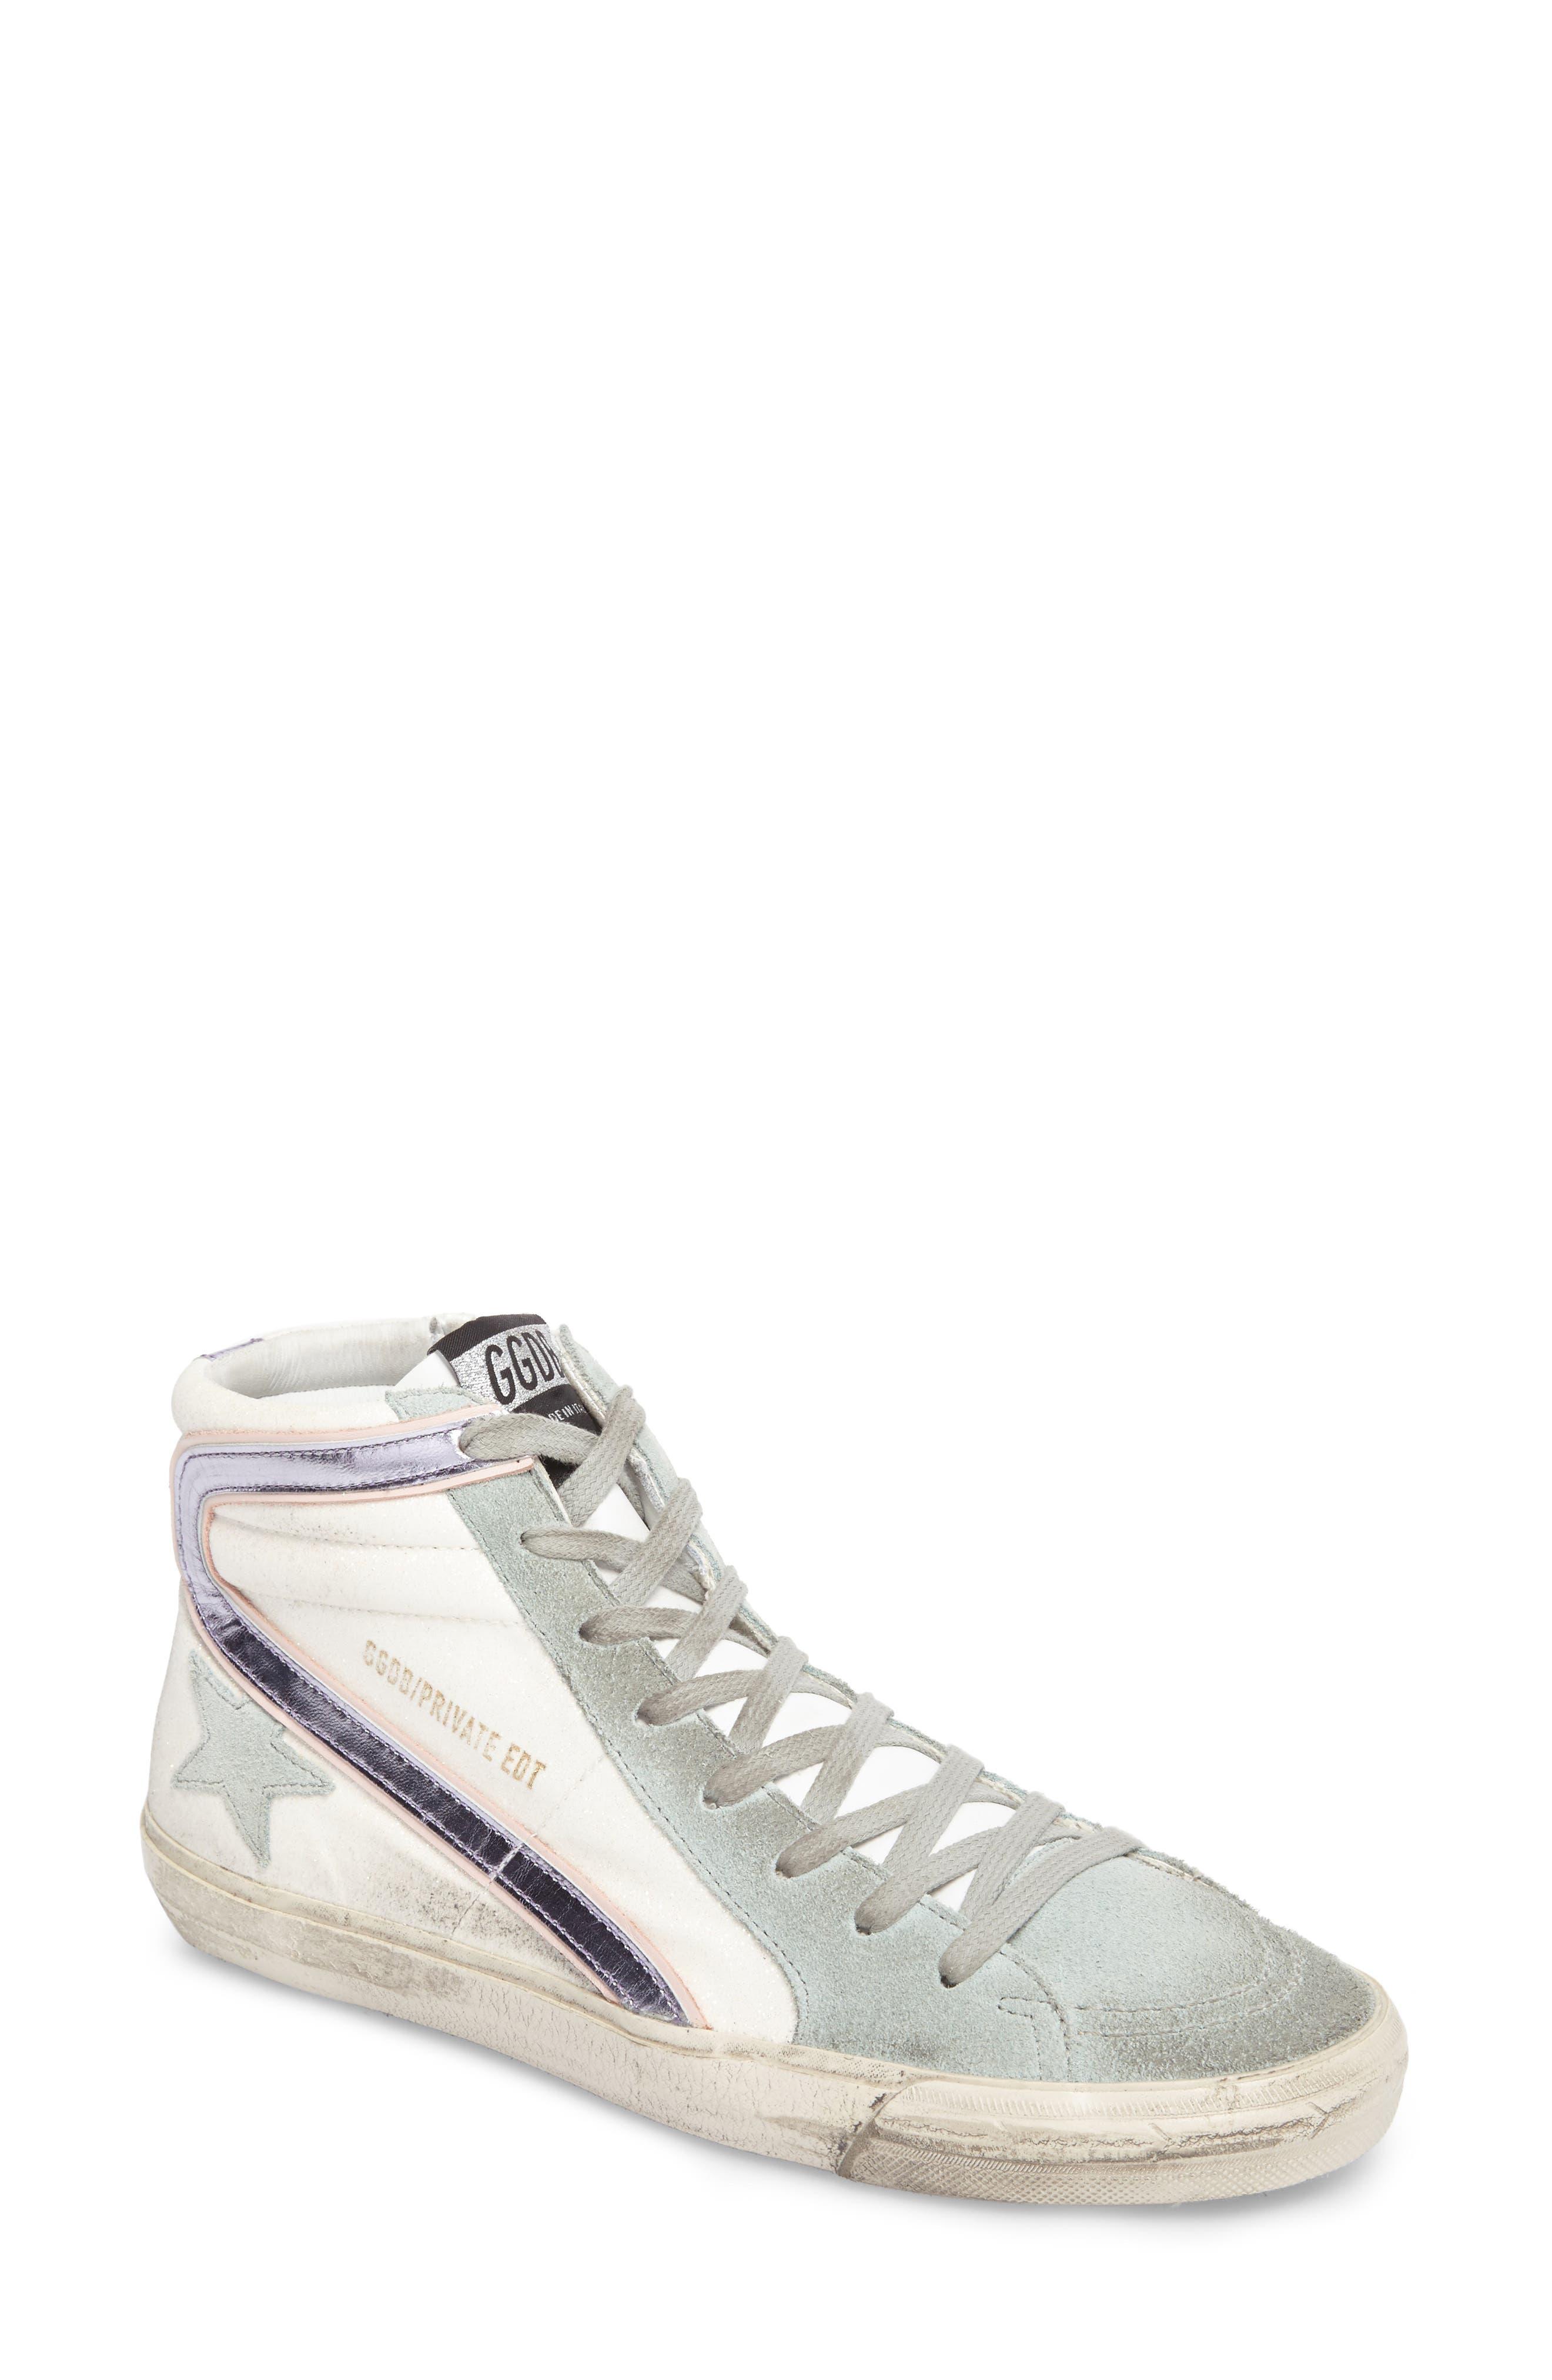 Slide High Top Sneaker,                         Main,                         color, White/ Mint Green